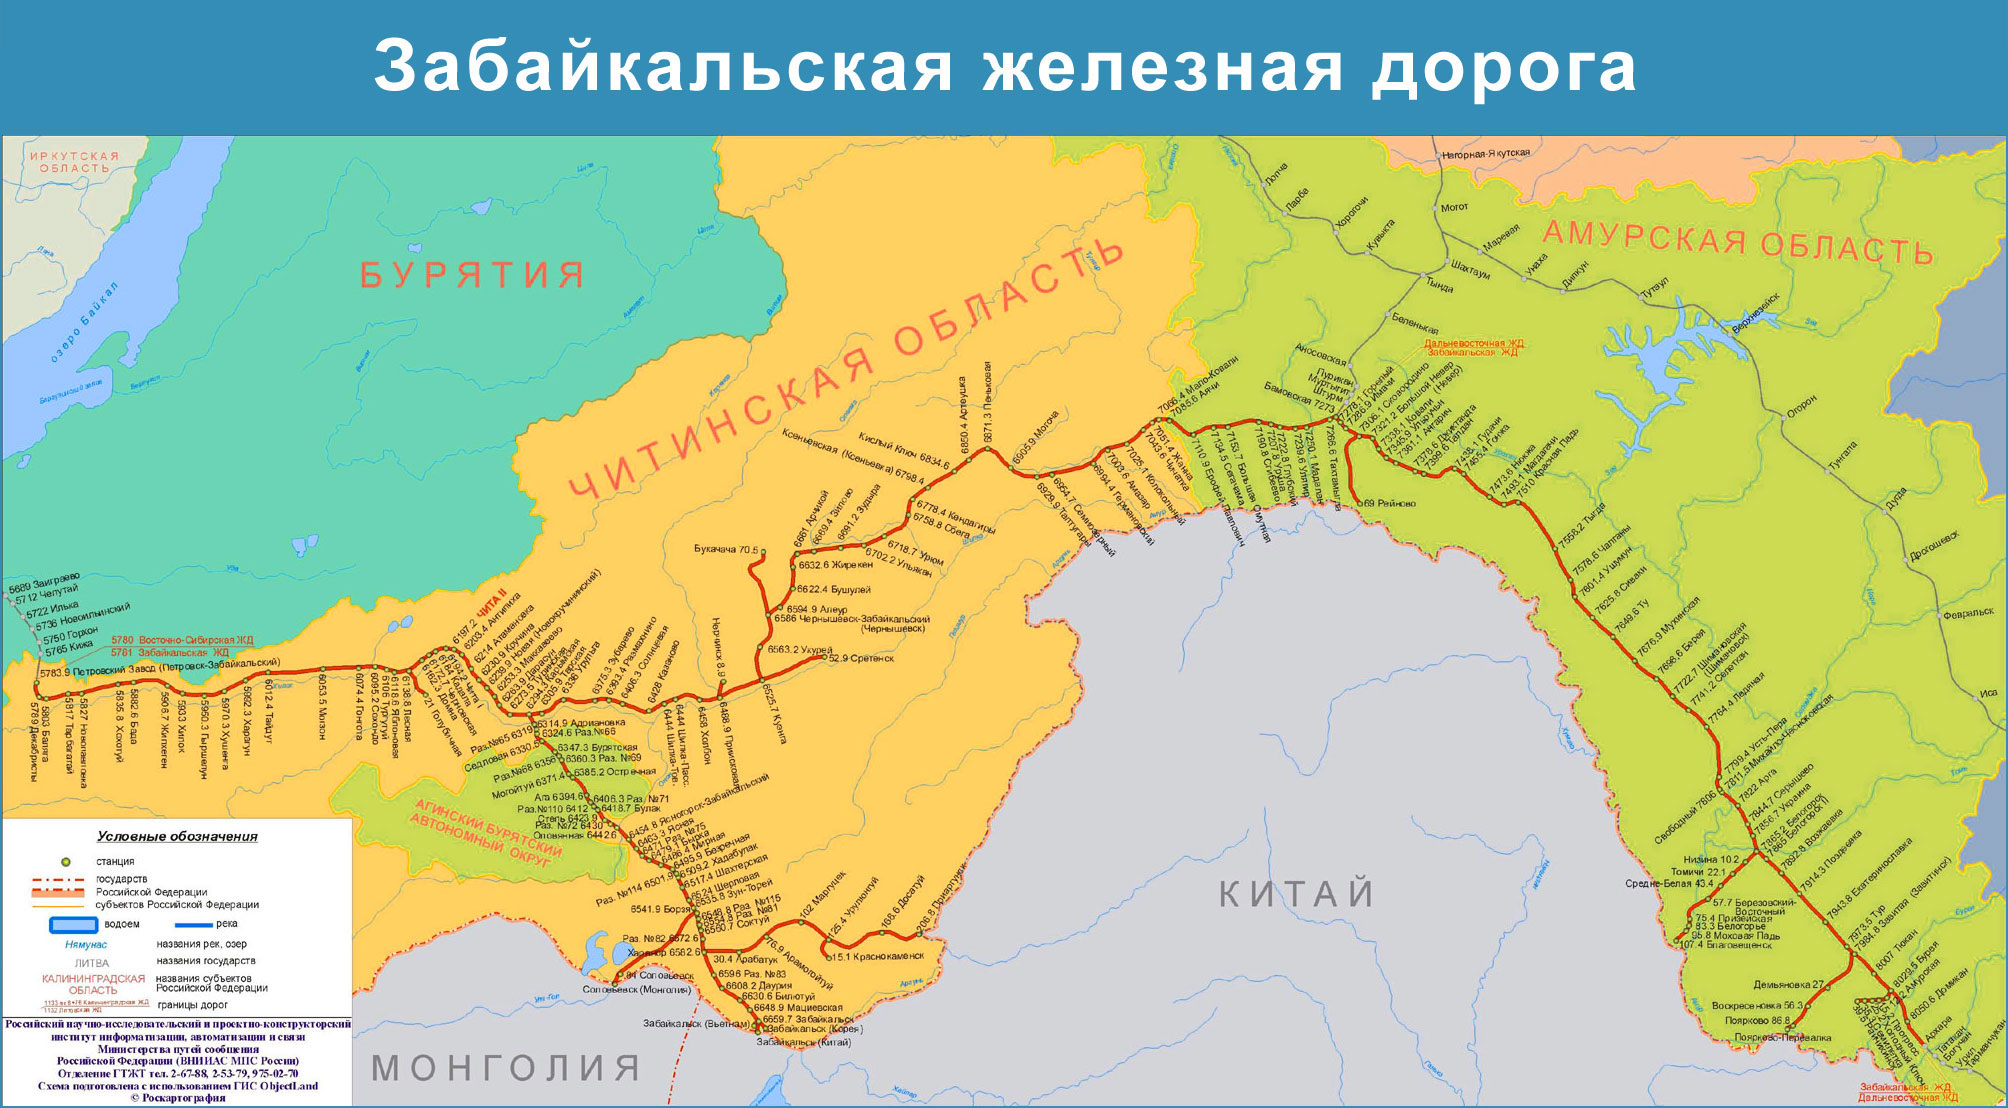 Карты железных дорог России: http://gruzexpress.umi.ru/karty_zheleznyh_dorog_rossii/